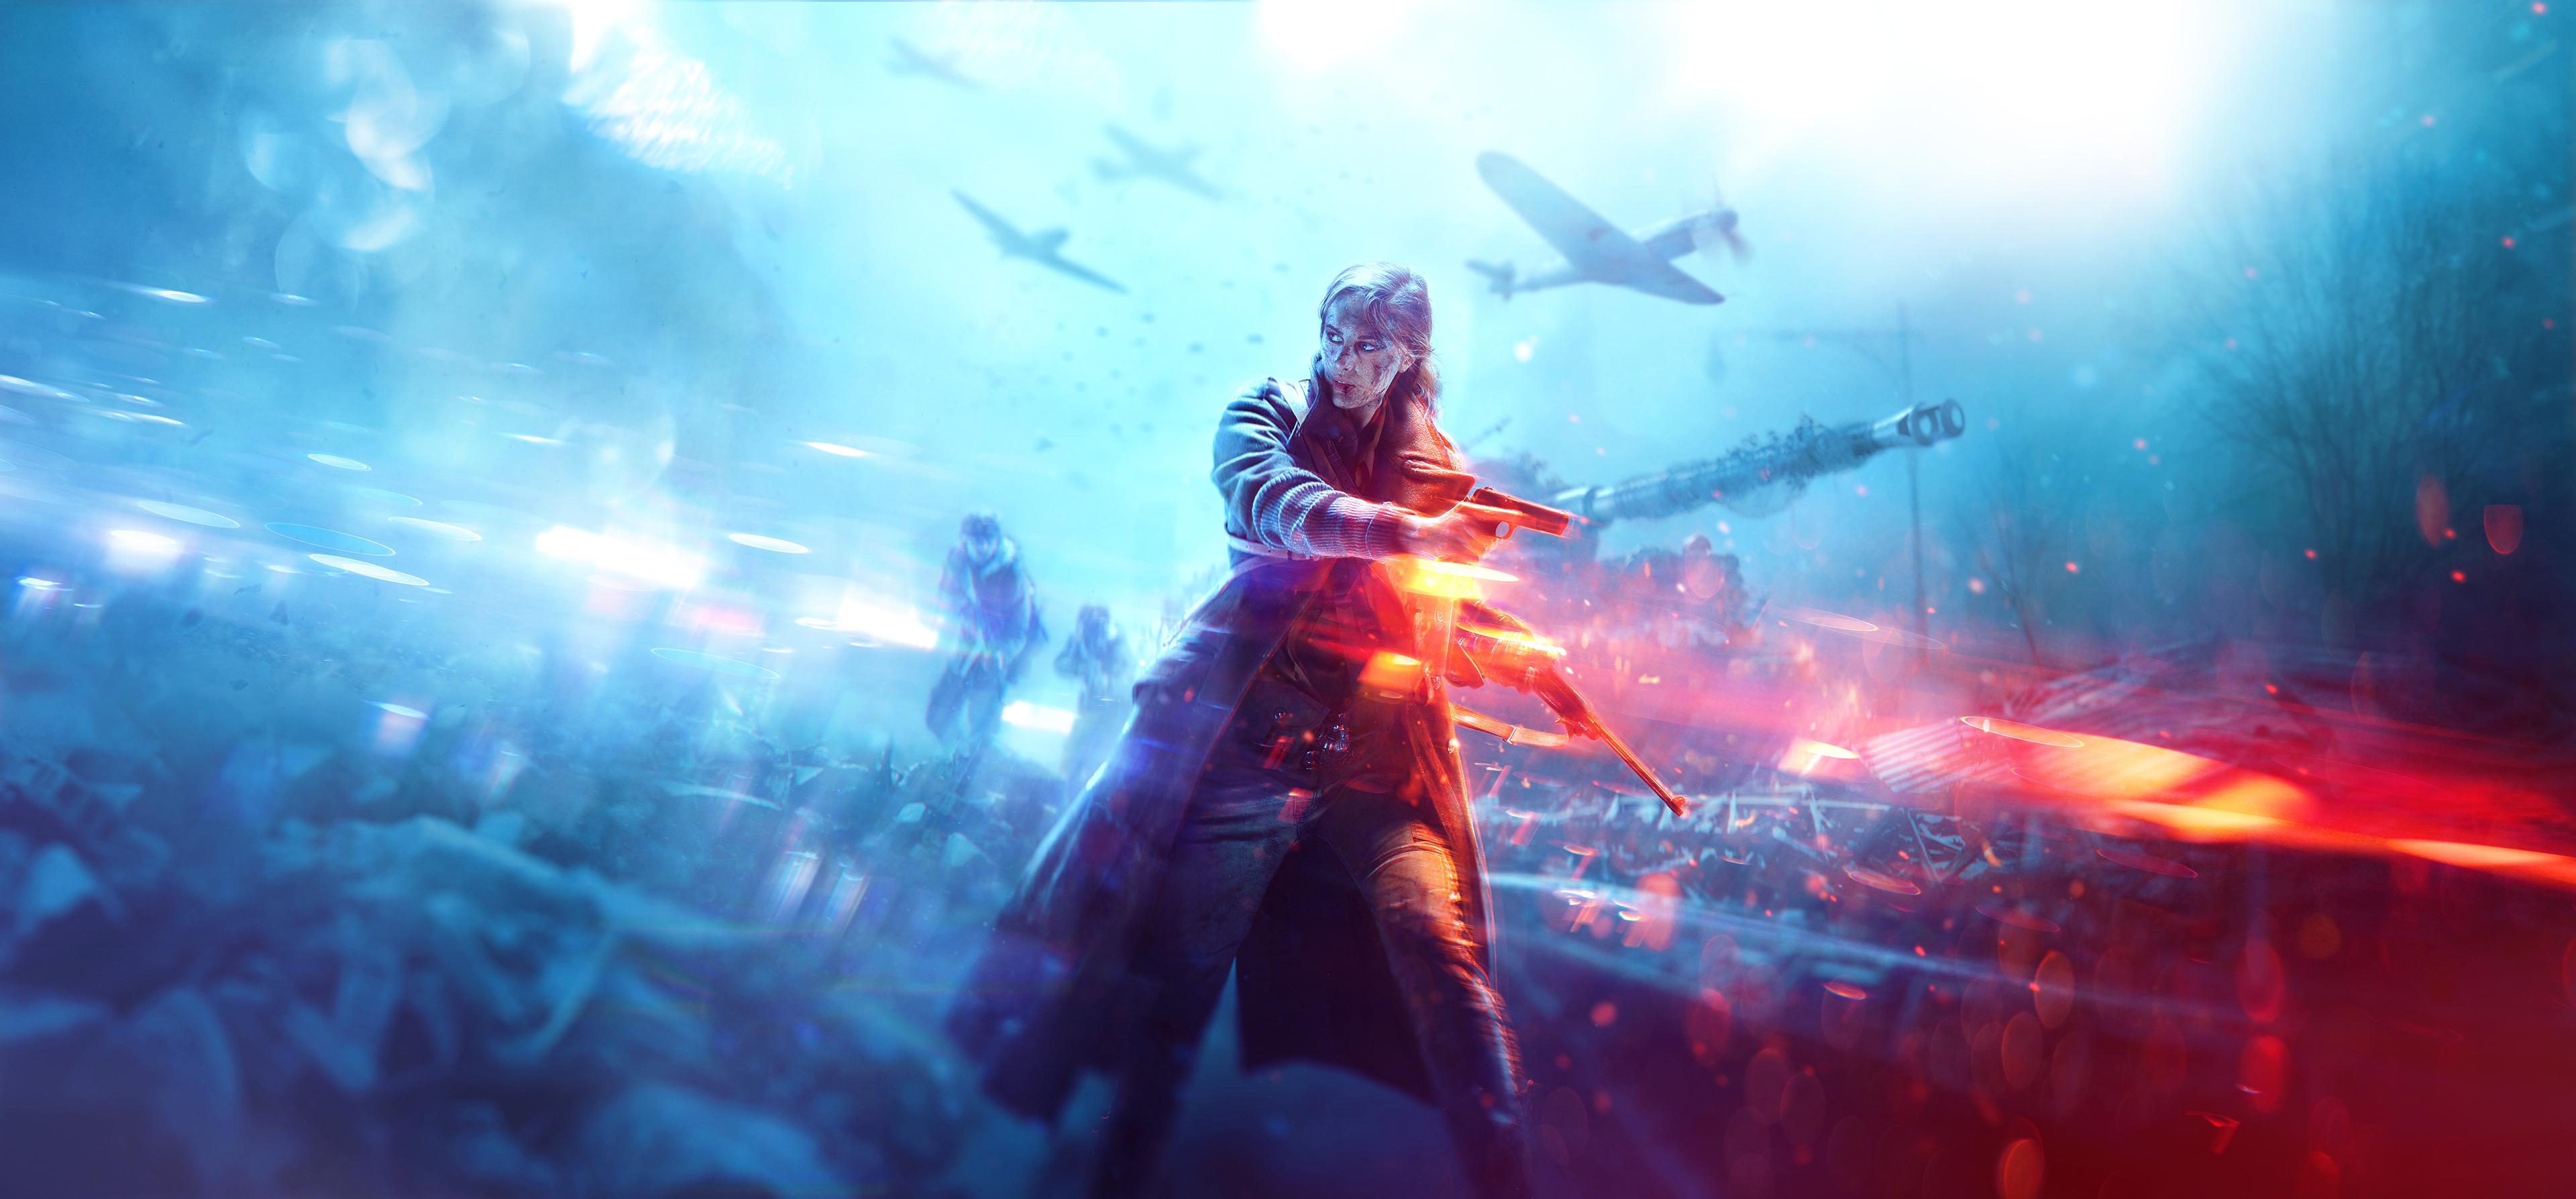 2560x1080 Playerunknowns Battlegrounds 2017 Game 2560x1080: 2560x1080 Battlefield V Warrior Girl 4k 2560x1080